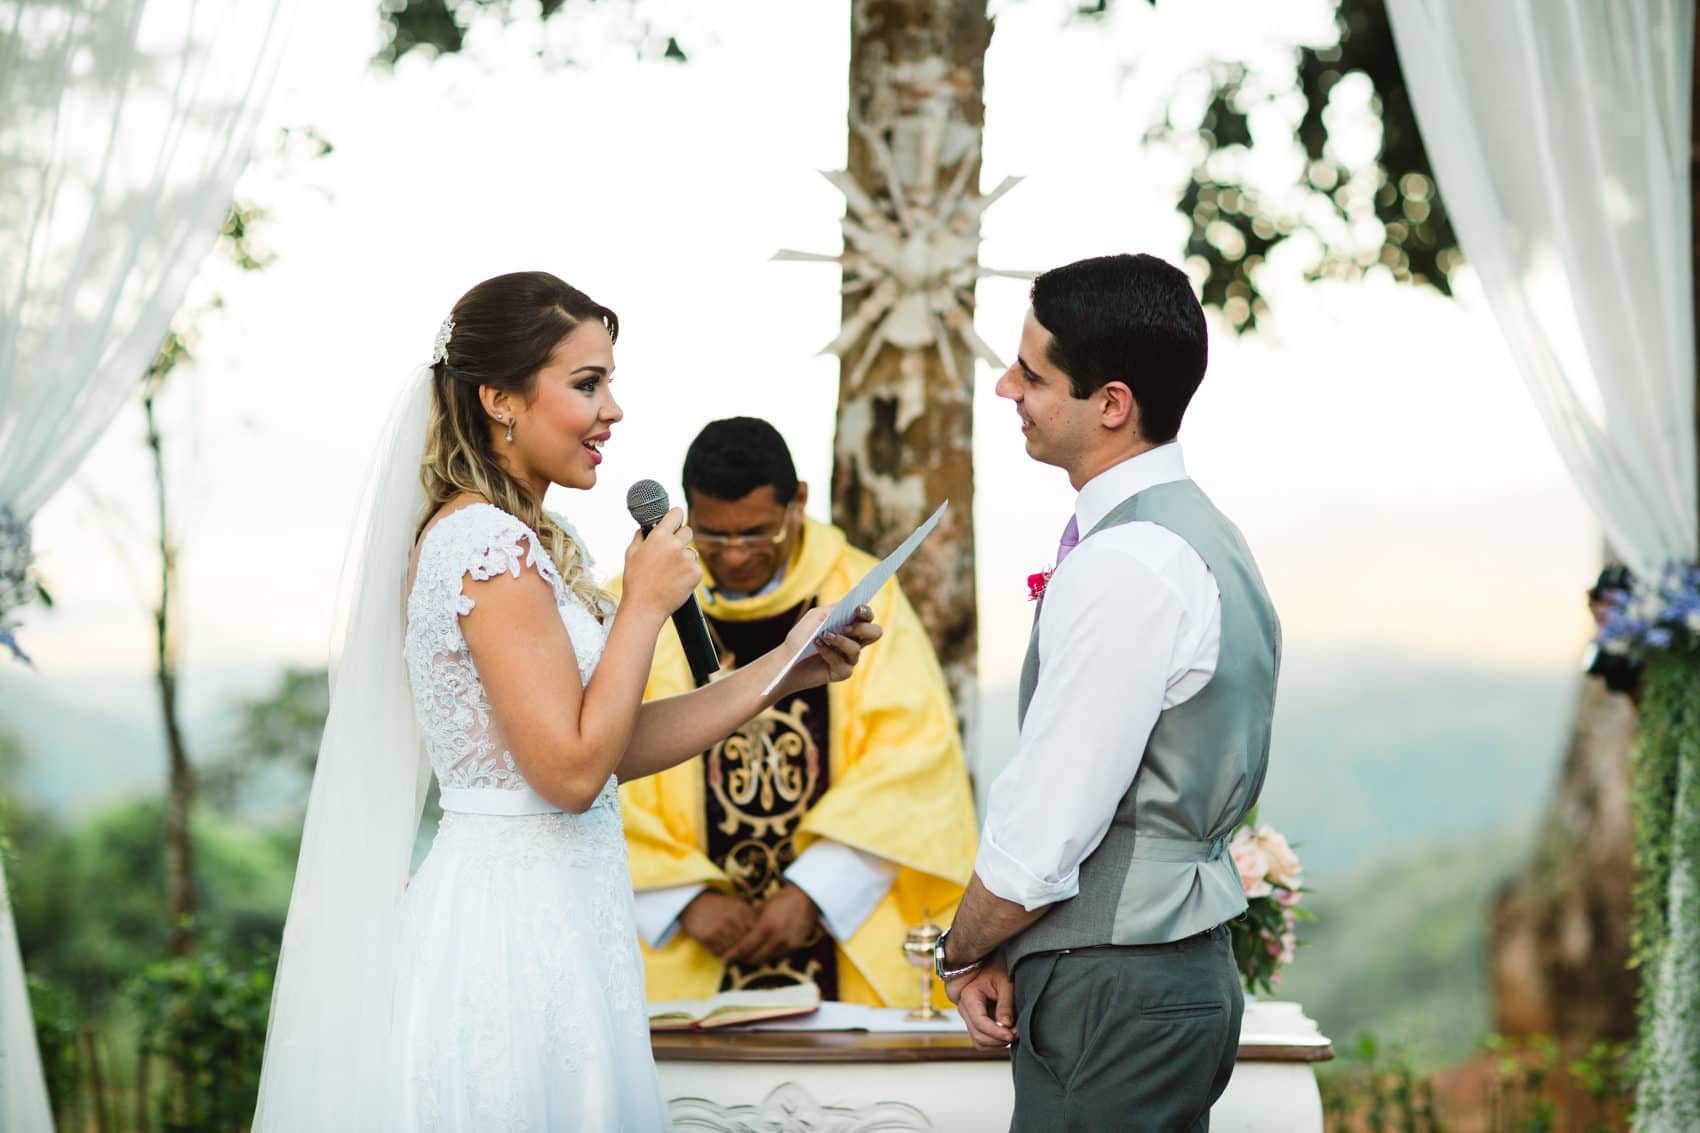 casamento-sitio-serra-guaramiranga-41